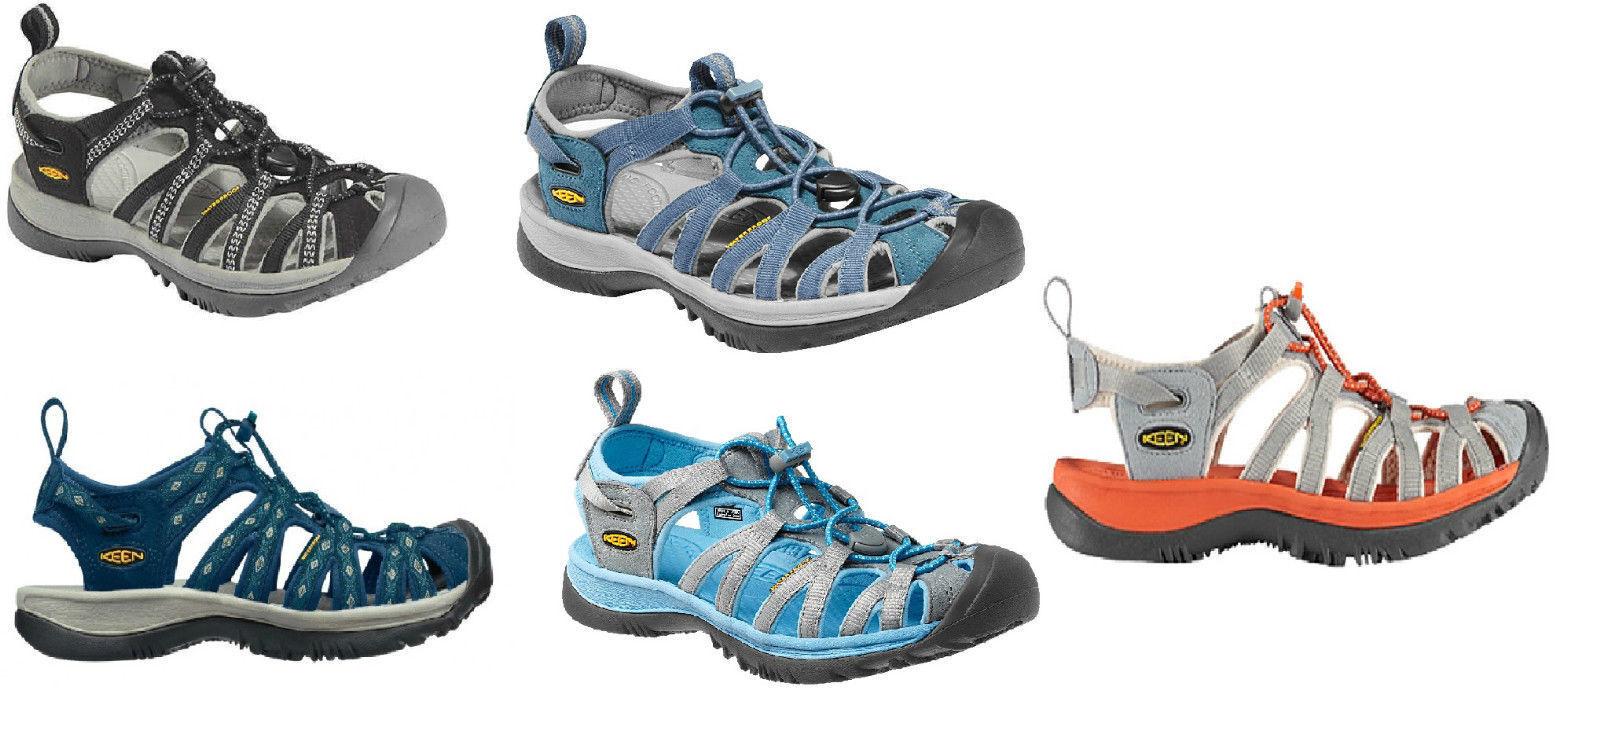 Keen Whisper Damen Trekking Wander Freizeit Sandale neue Farben 2018 anscheuen